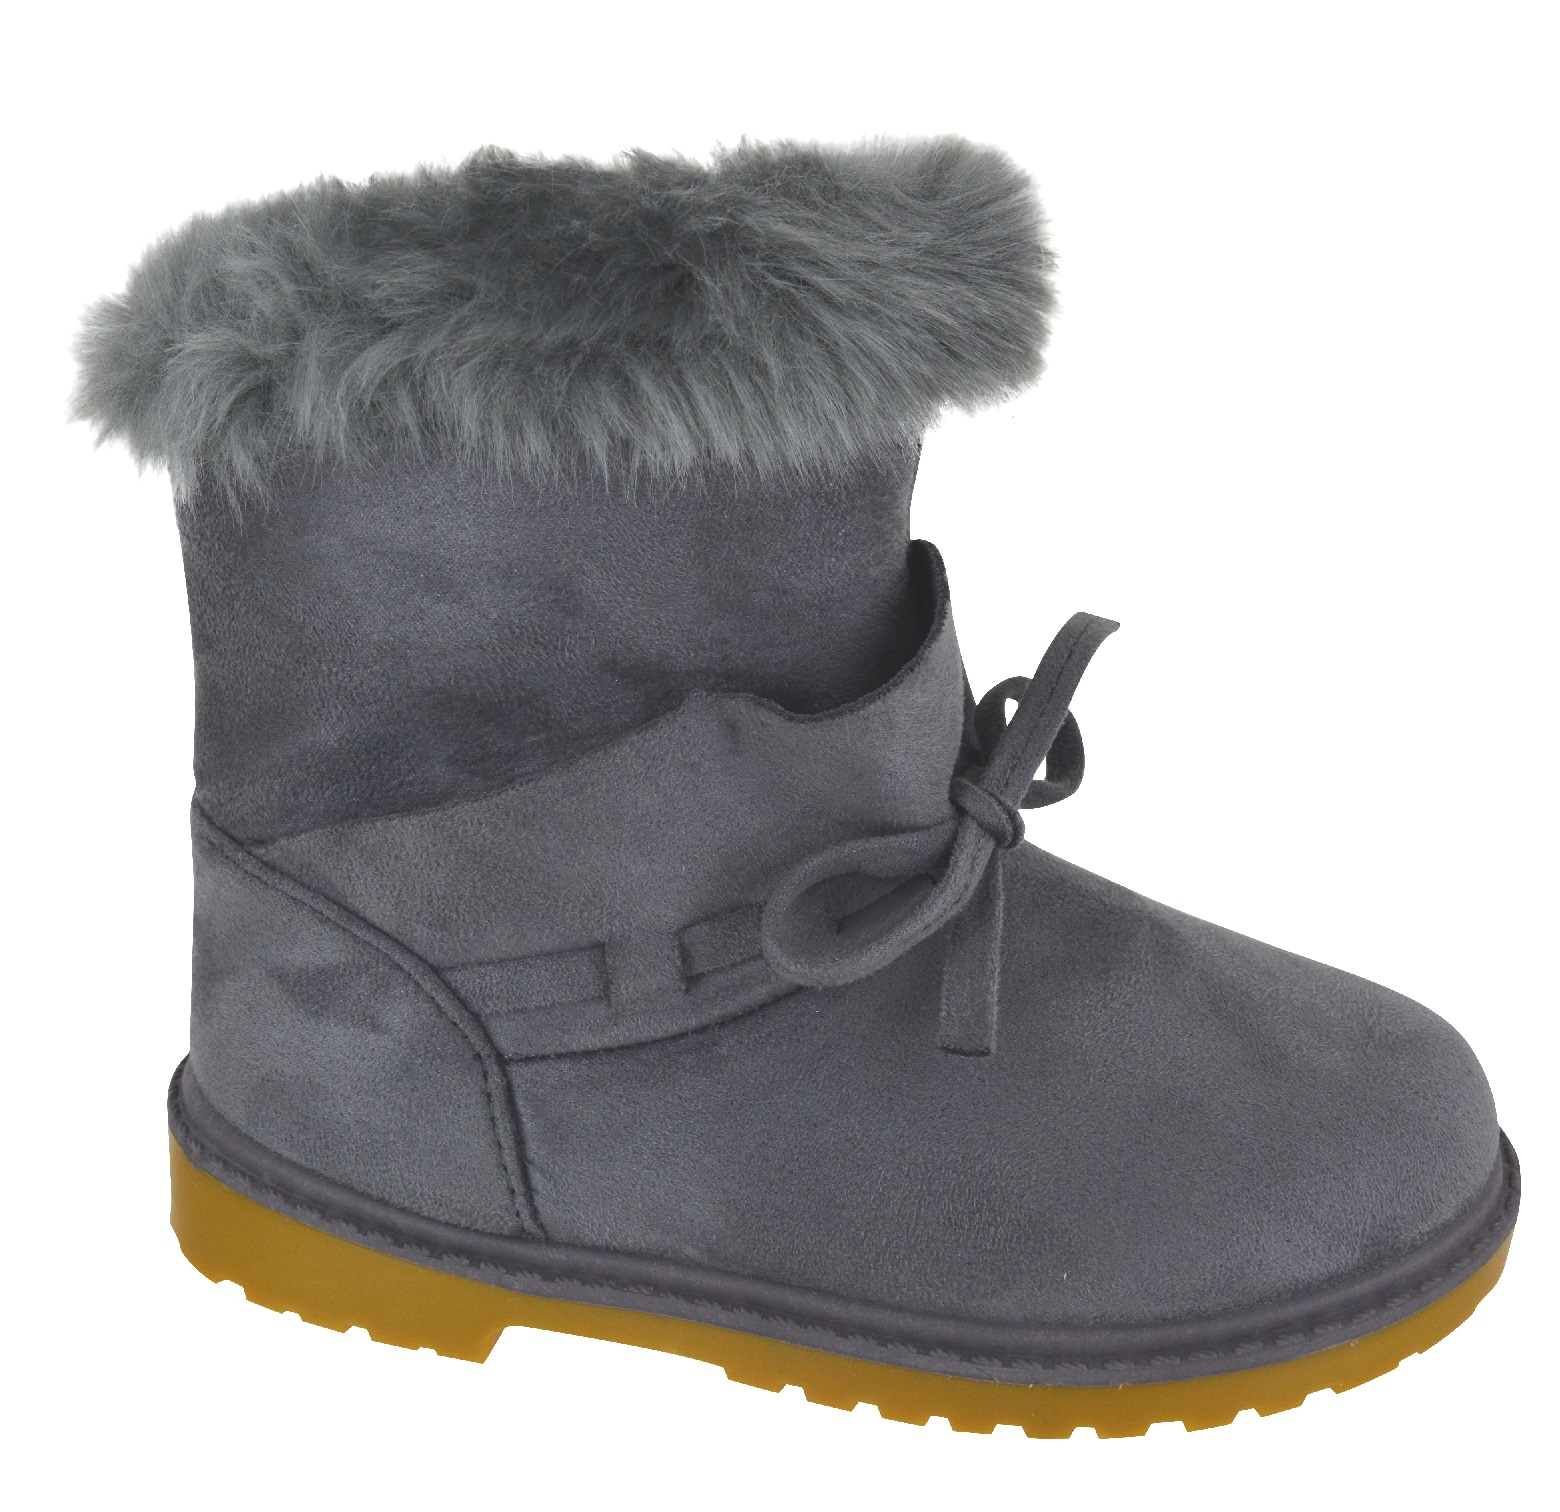 KIDS-GIRLS-NEW-FAUX-FUR-LINED-WARM-WINTER-ZIP-GRIP-SOLE-BOW-SHOE-BOOTS-SIZE-8-13